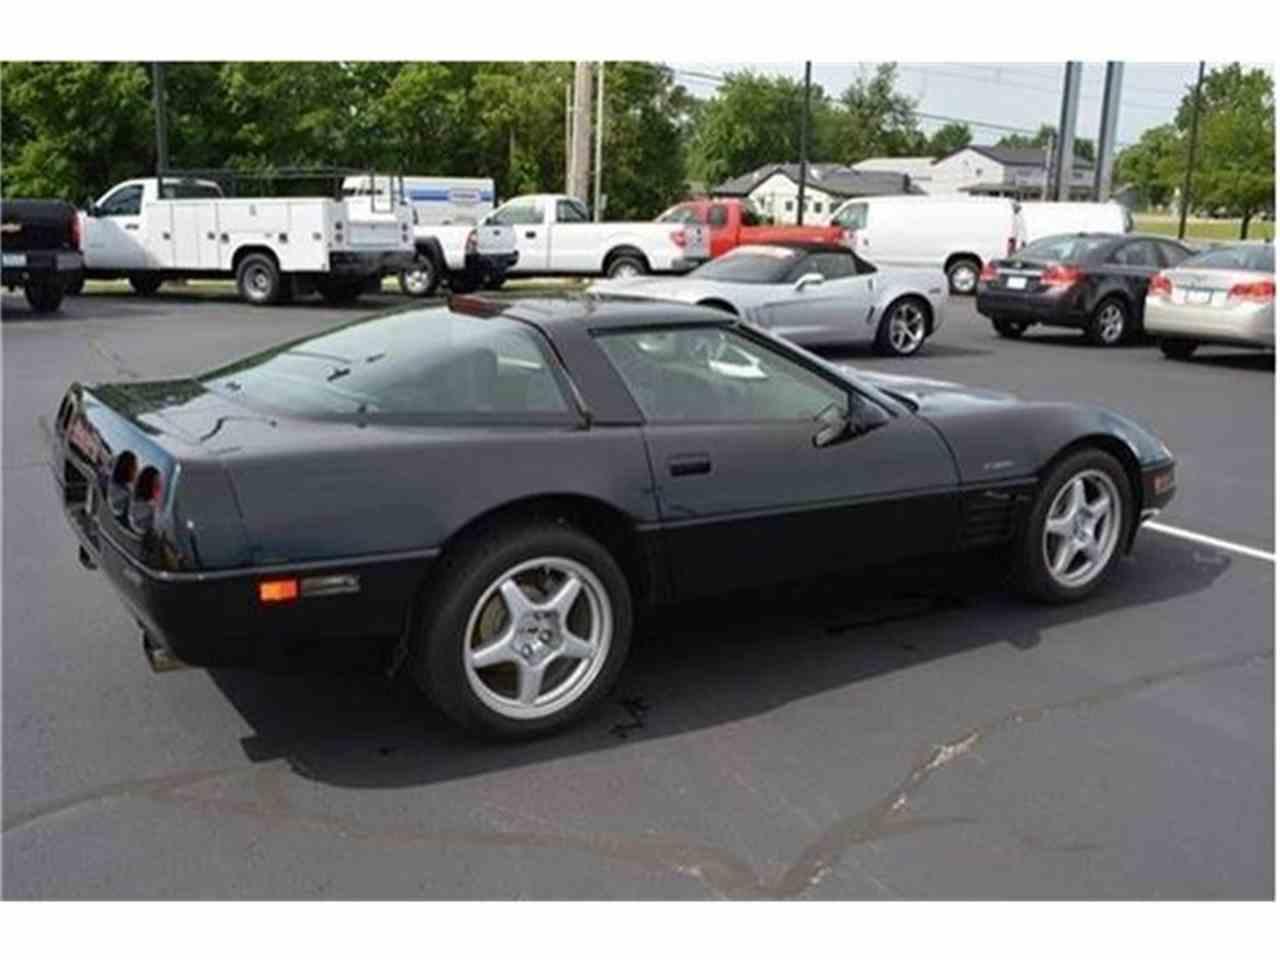 1992 Chevrolet Corvette Zr1 For Sale Classiccars Com